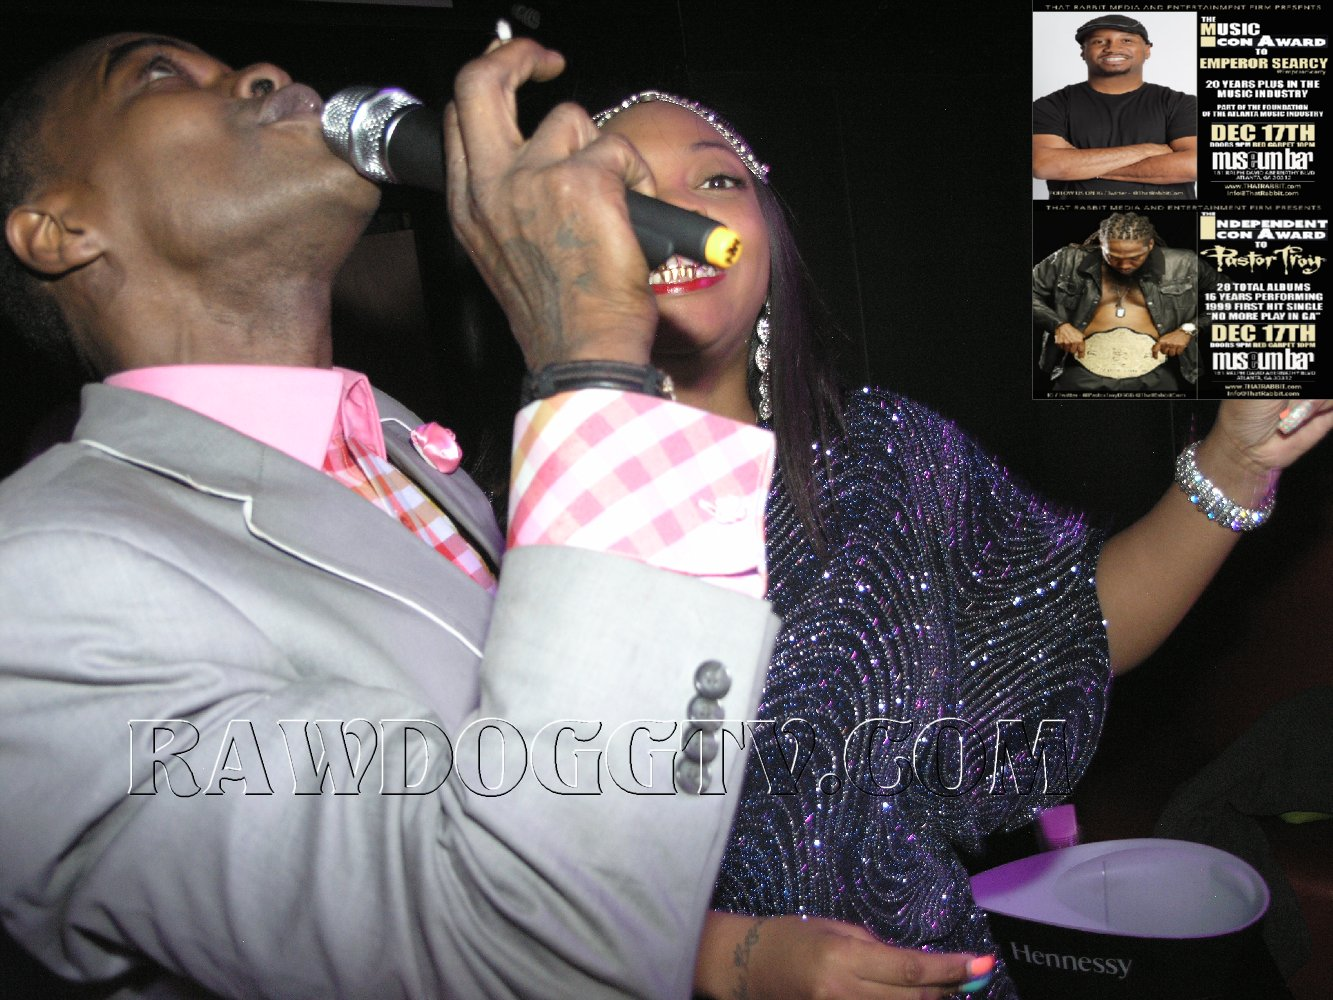 ThatRabbit Magazine Photos-ATL Legends Reunion-The Music Icon Award-Museum Bar Atlanta-Ray Hamilton- dec 17 2015 RAWDOGGTV 305-490-2182 (189)